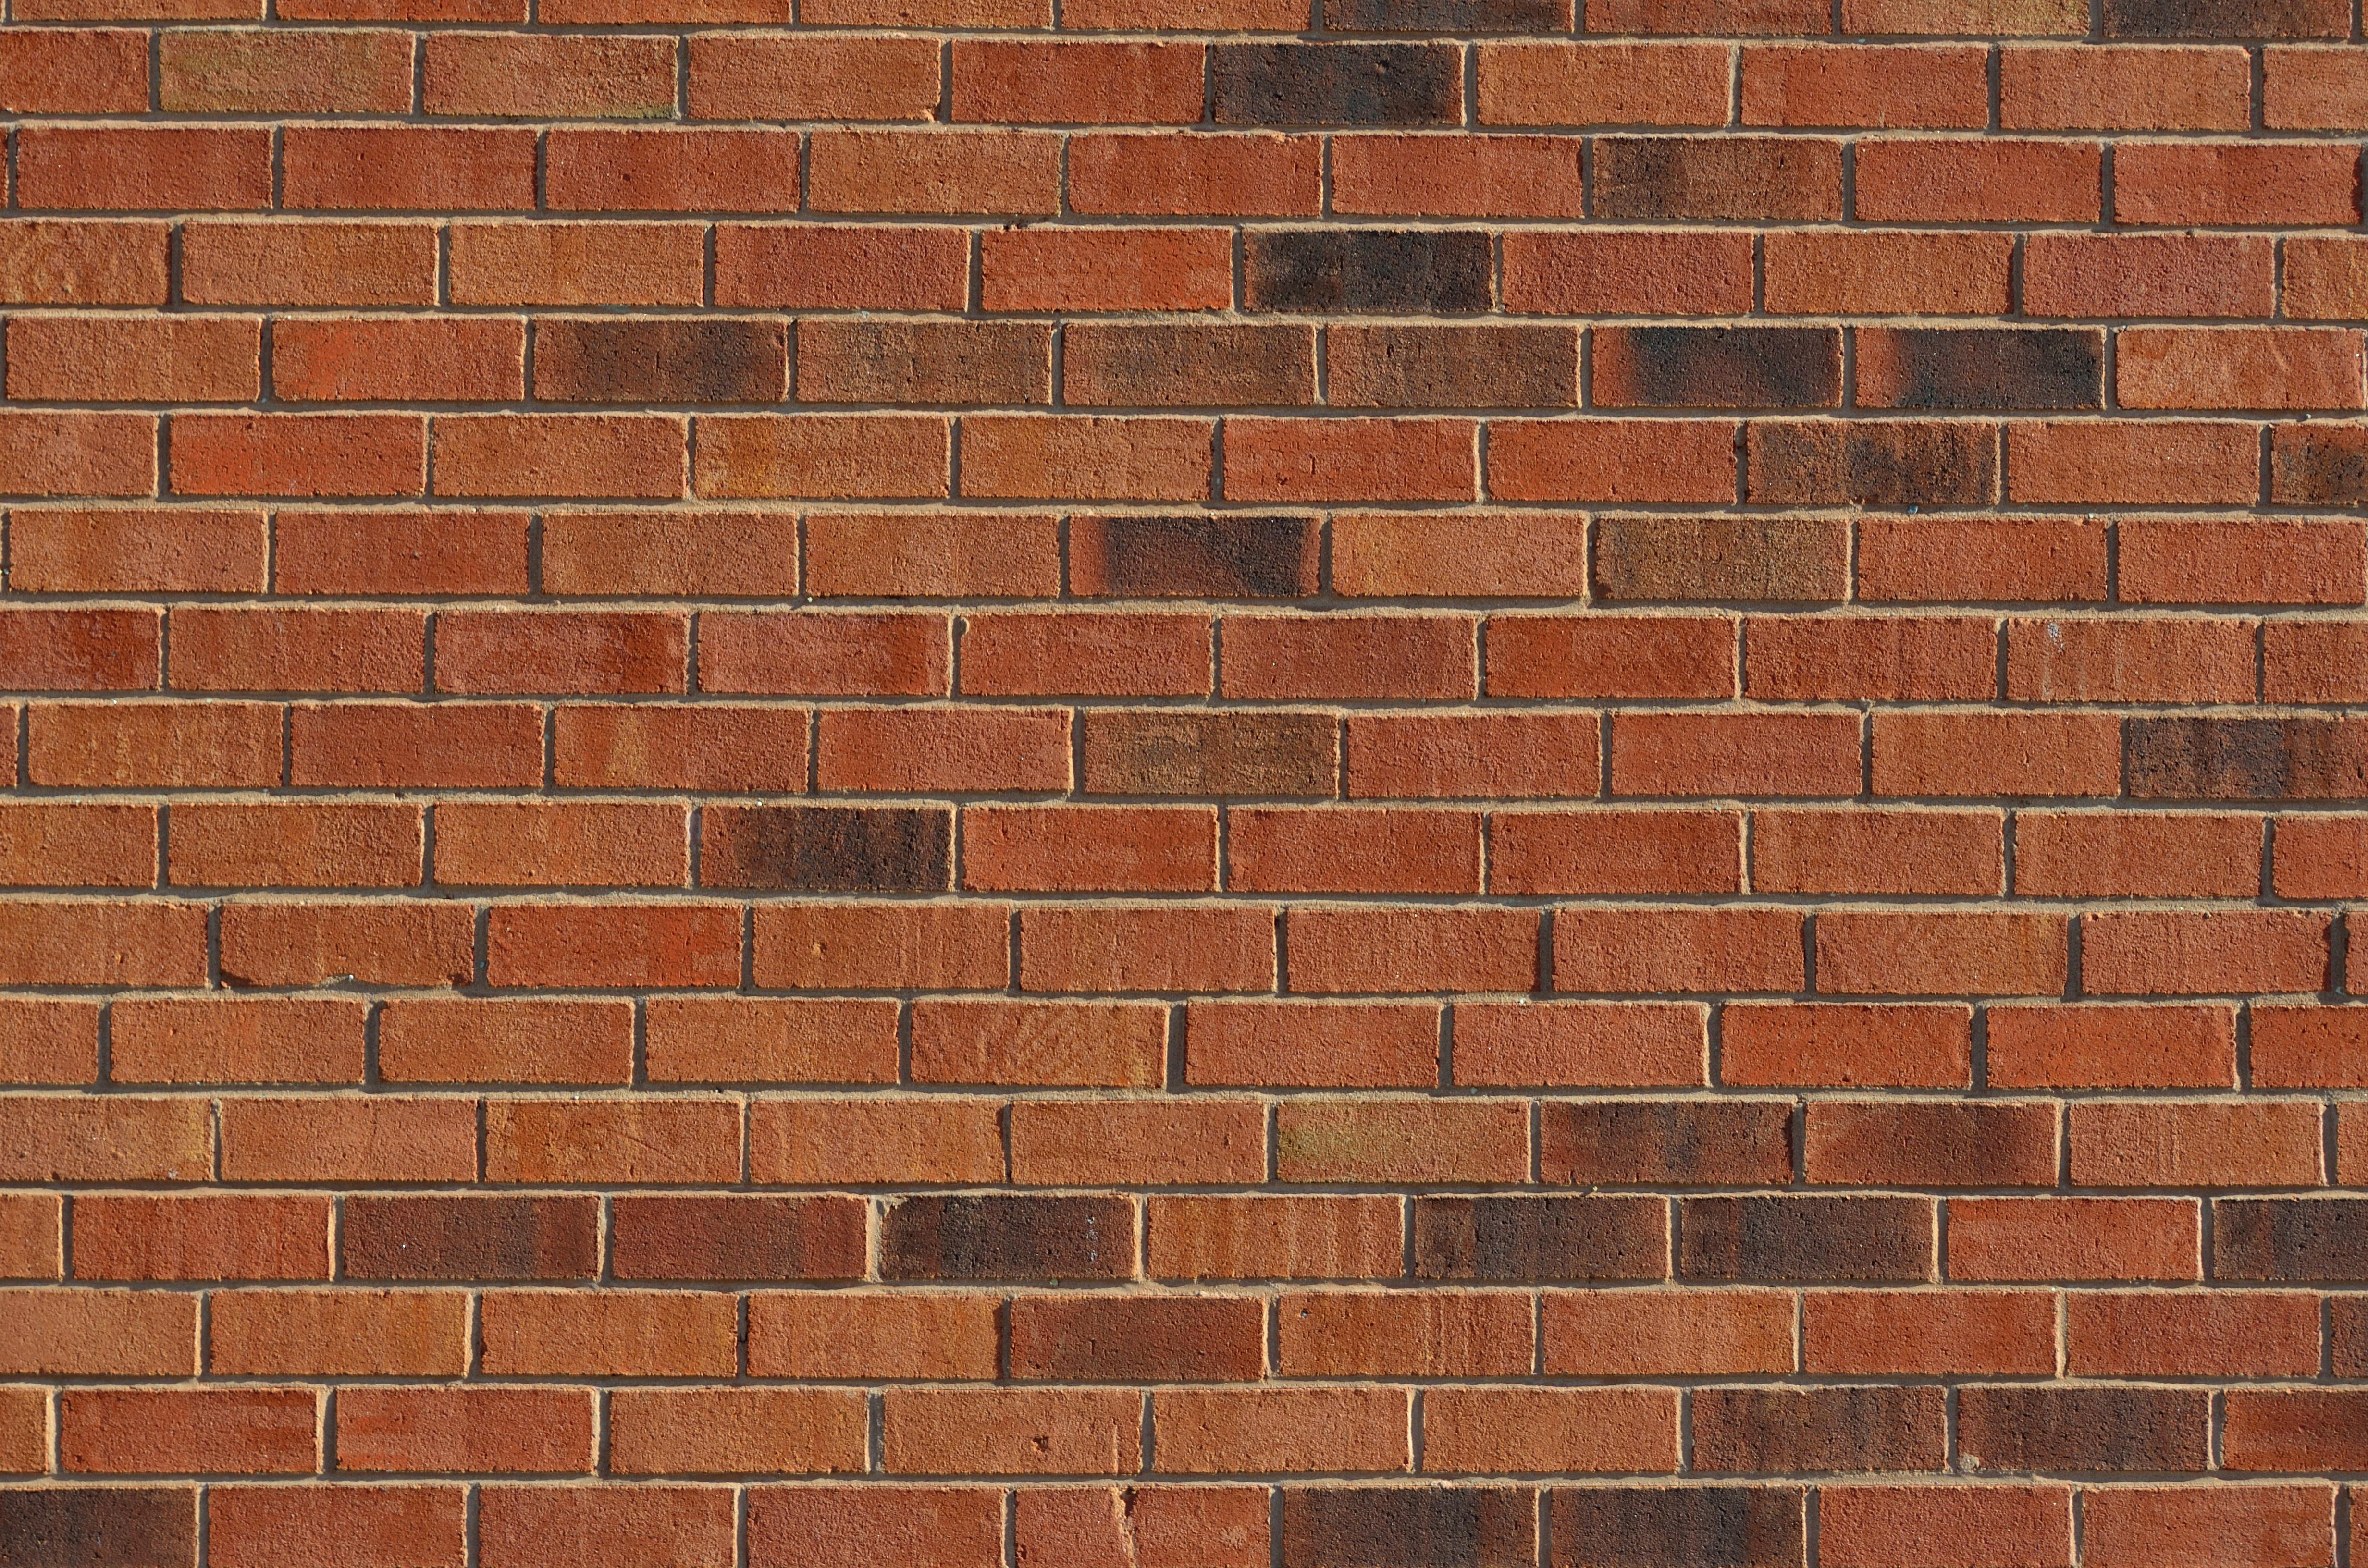 Fotos gratis casa textura piso piedra patrn material pared